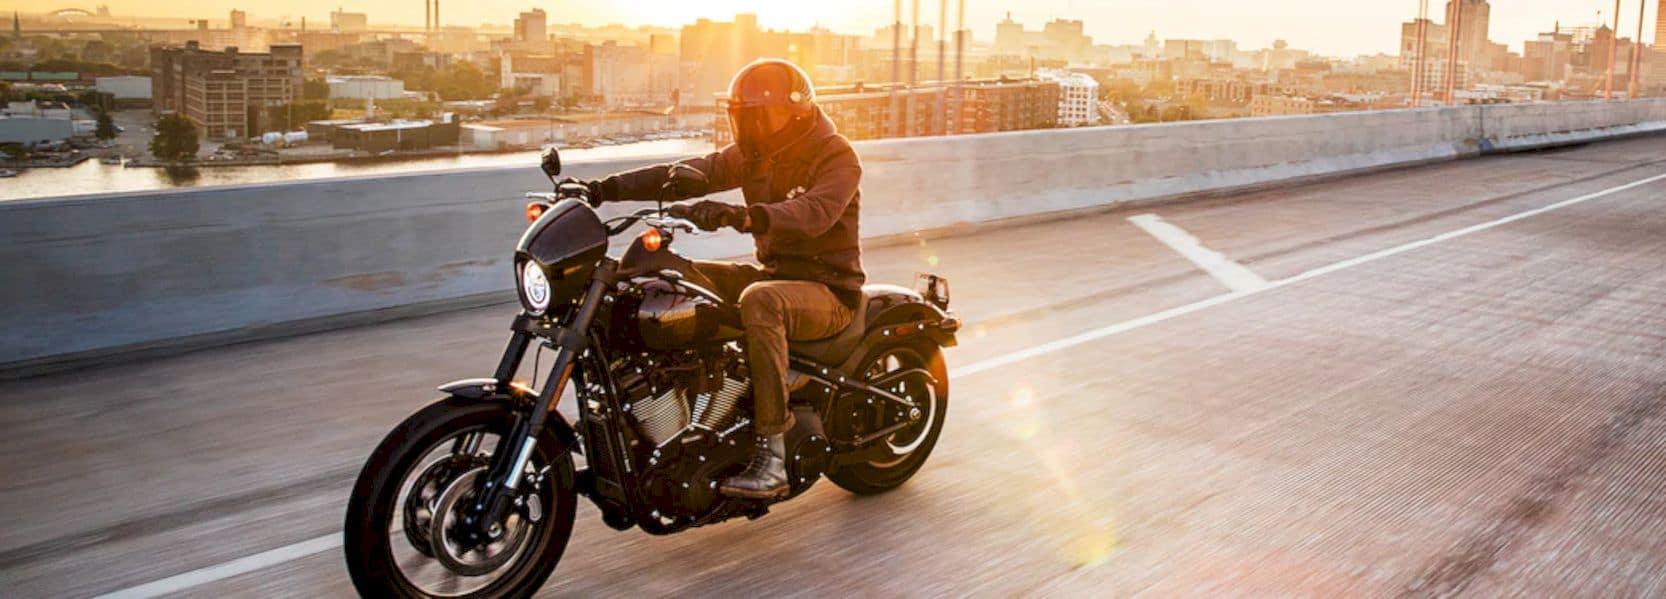 2020 Harley Davidson Low Rider S 9